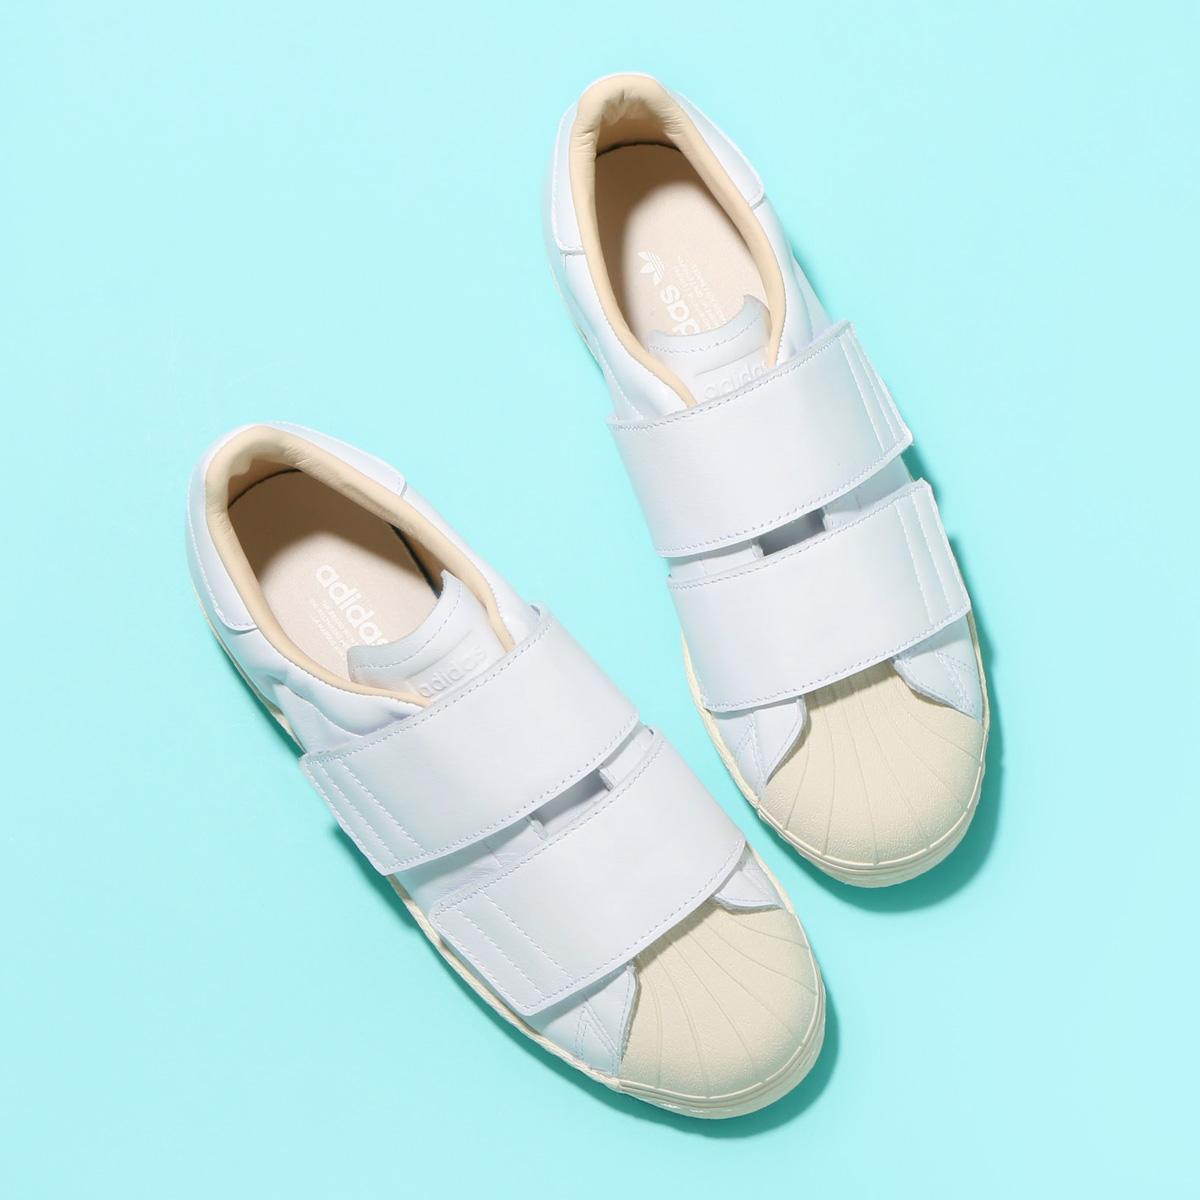 adidas Originals SS 80s VELCRO W(アディダス オリジナルス スーパースター 80s ベルクロ W) Running White/Running White/Linen18SS-I